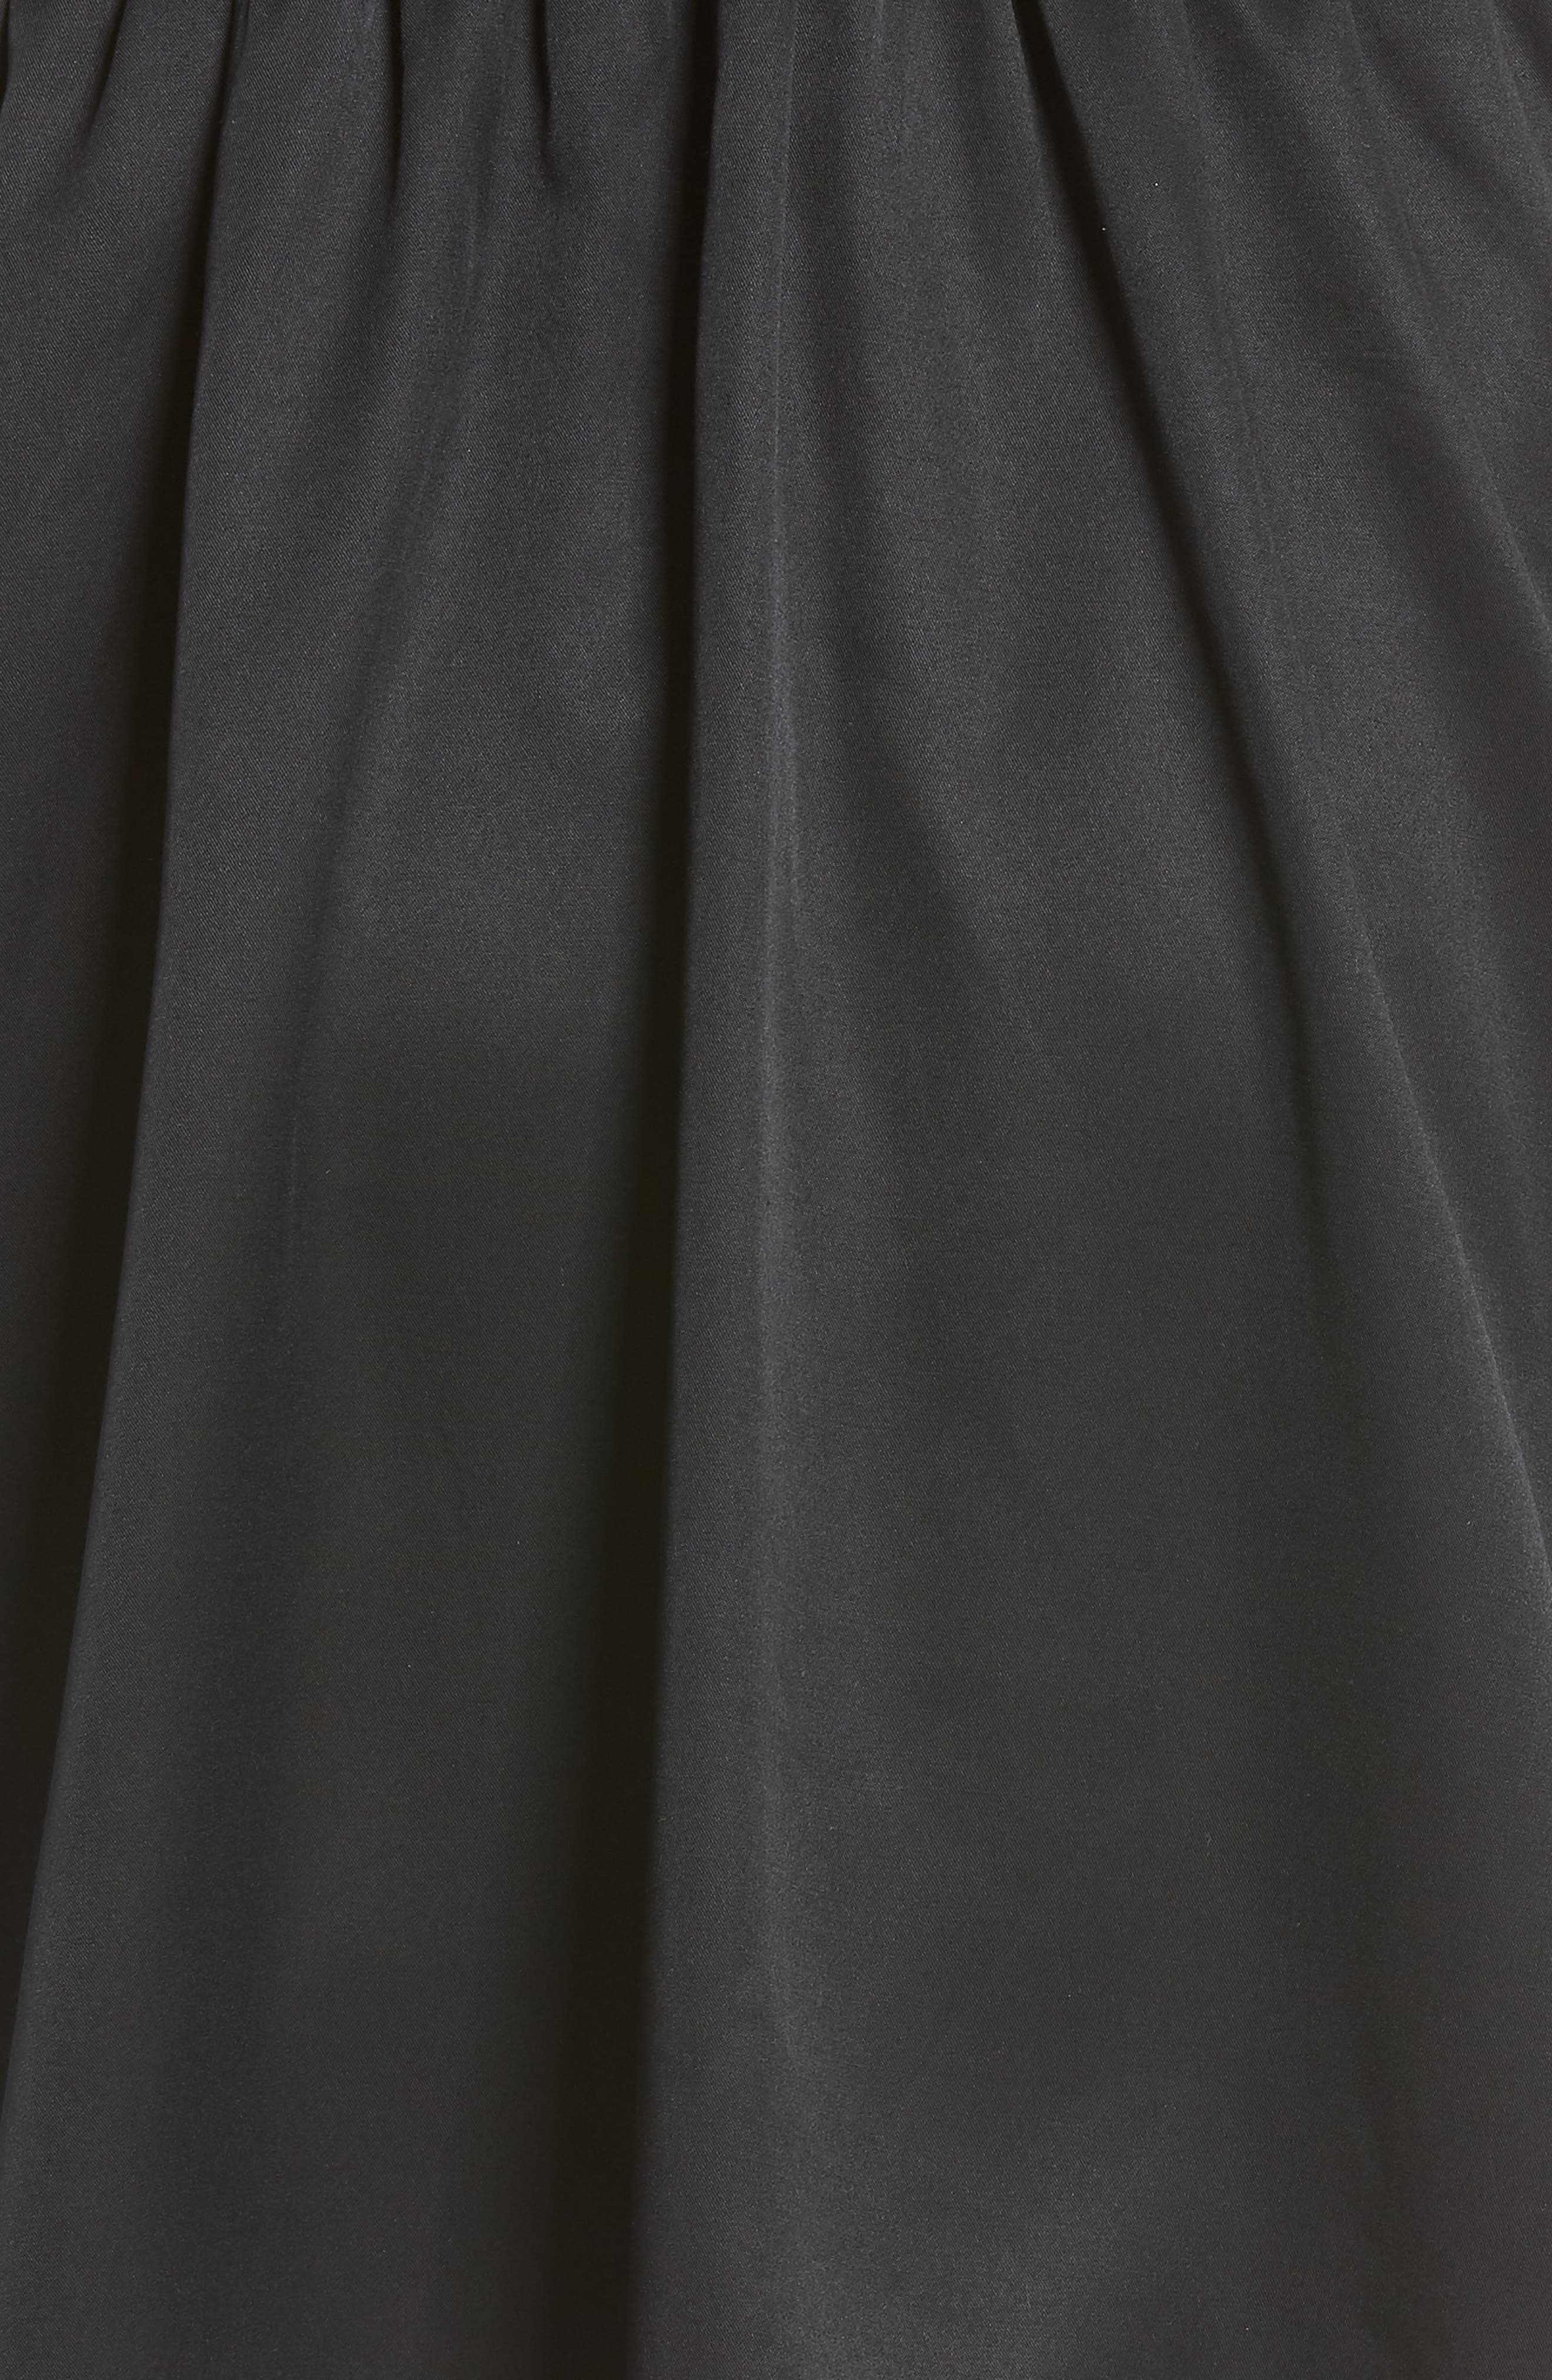 Ruffle Satin Dress,                             Alternate thumbnail 6, color,                             001